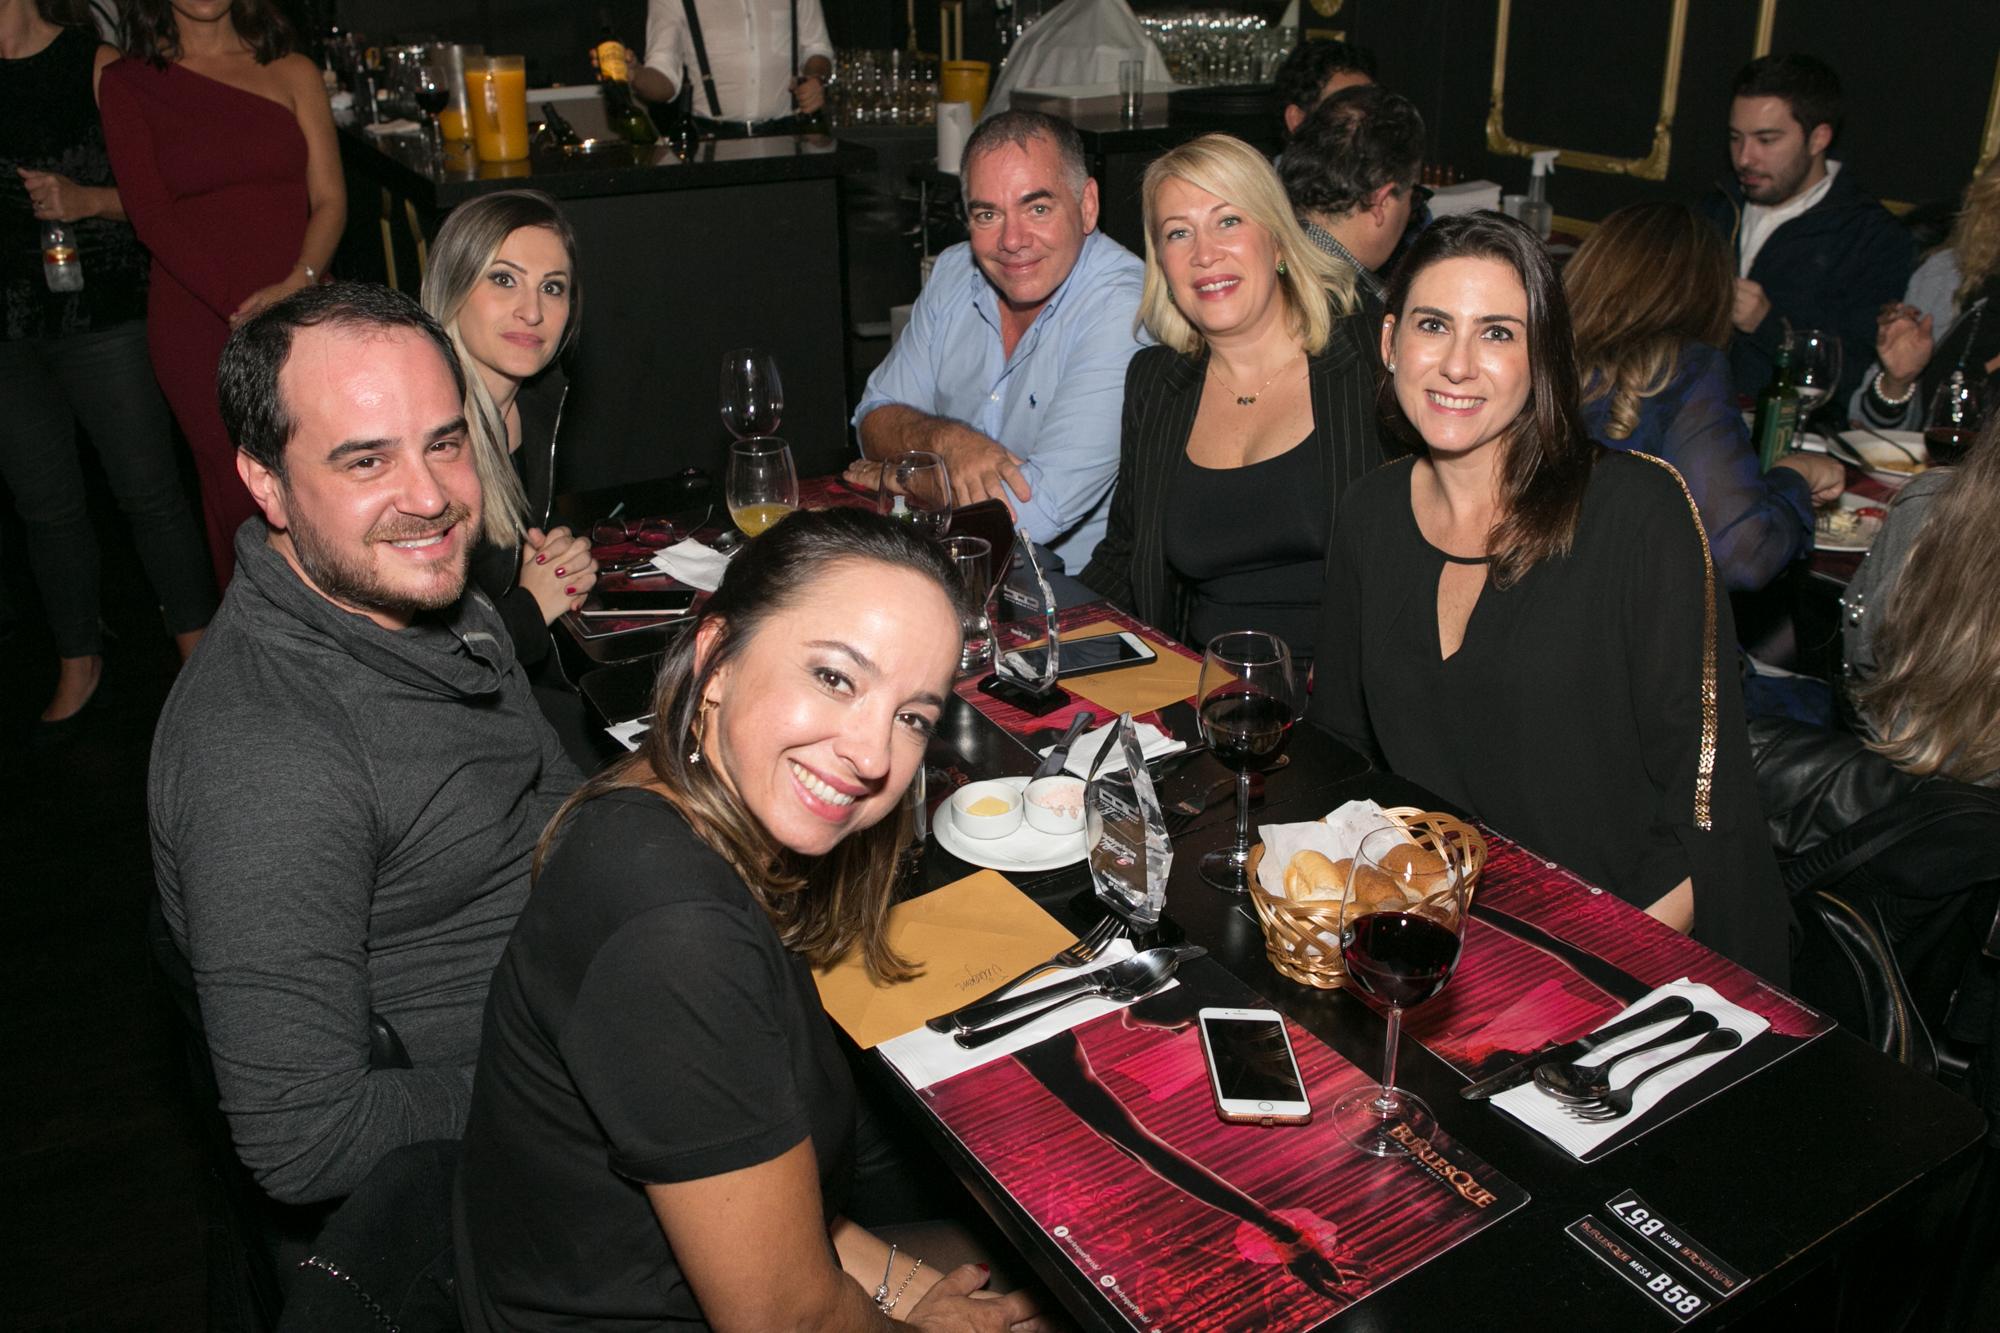 CAD - FESTA DE ENCERRAMENTO DE CICLO (13